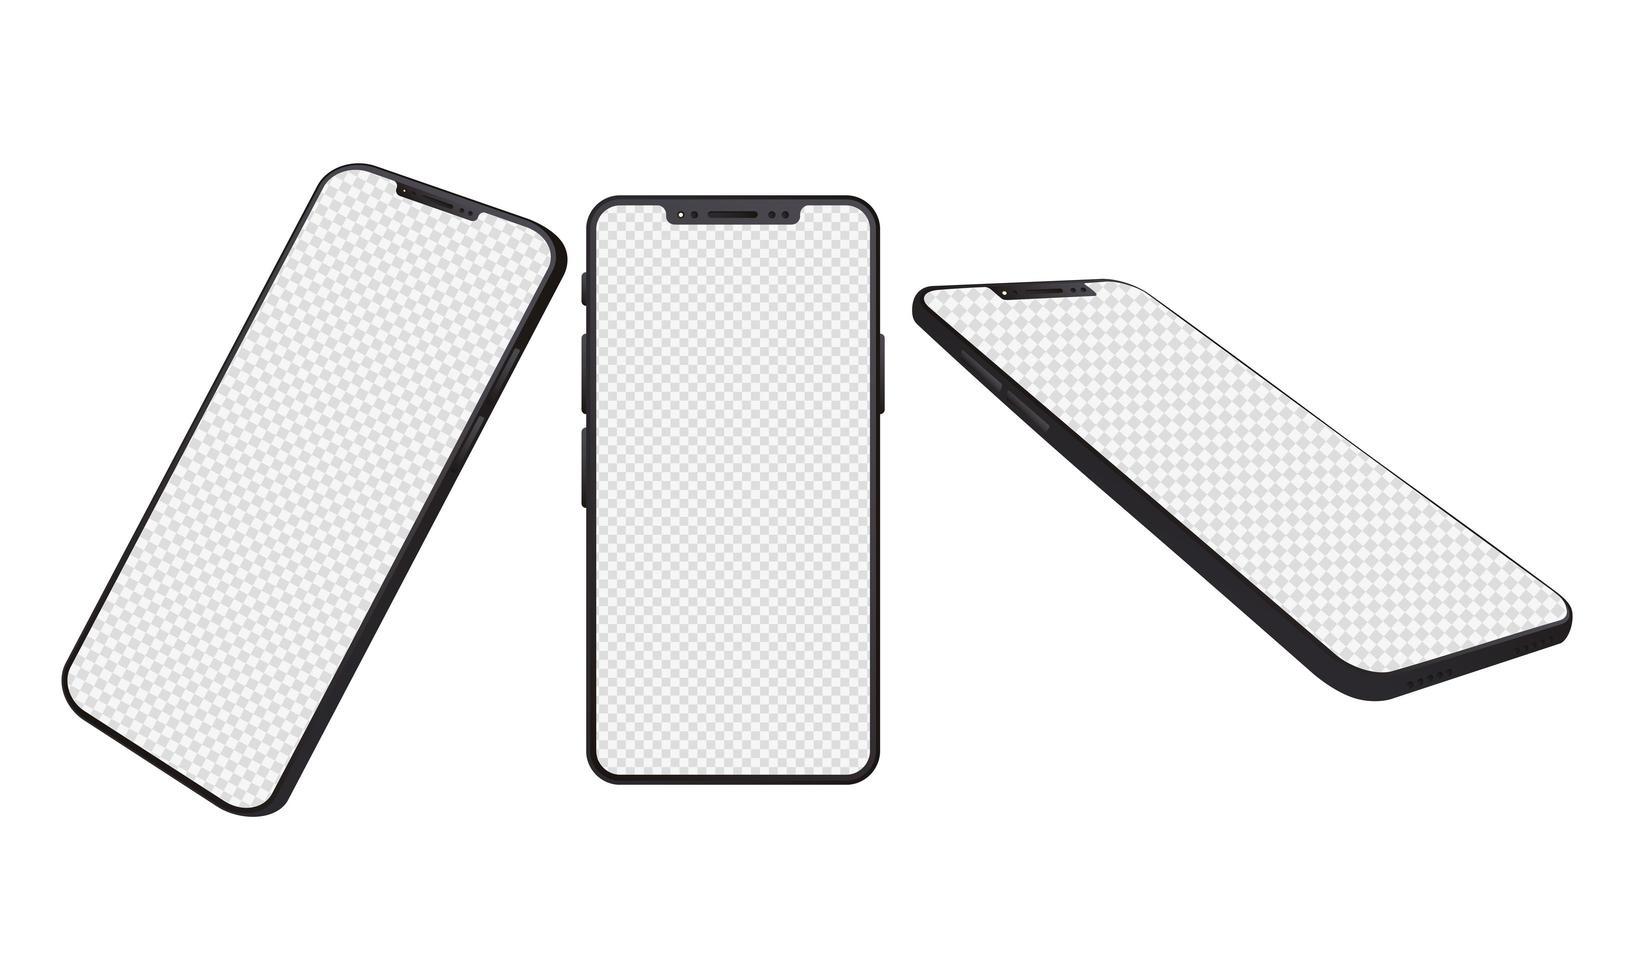 semplici dispositivi mock-up per smartphone vettore